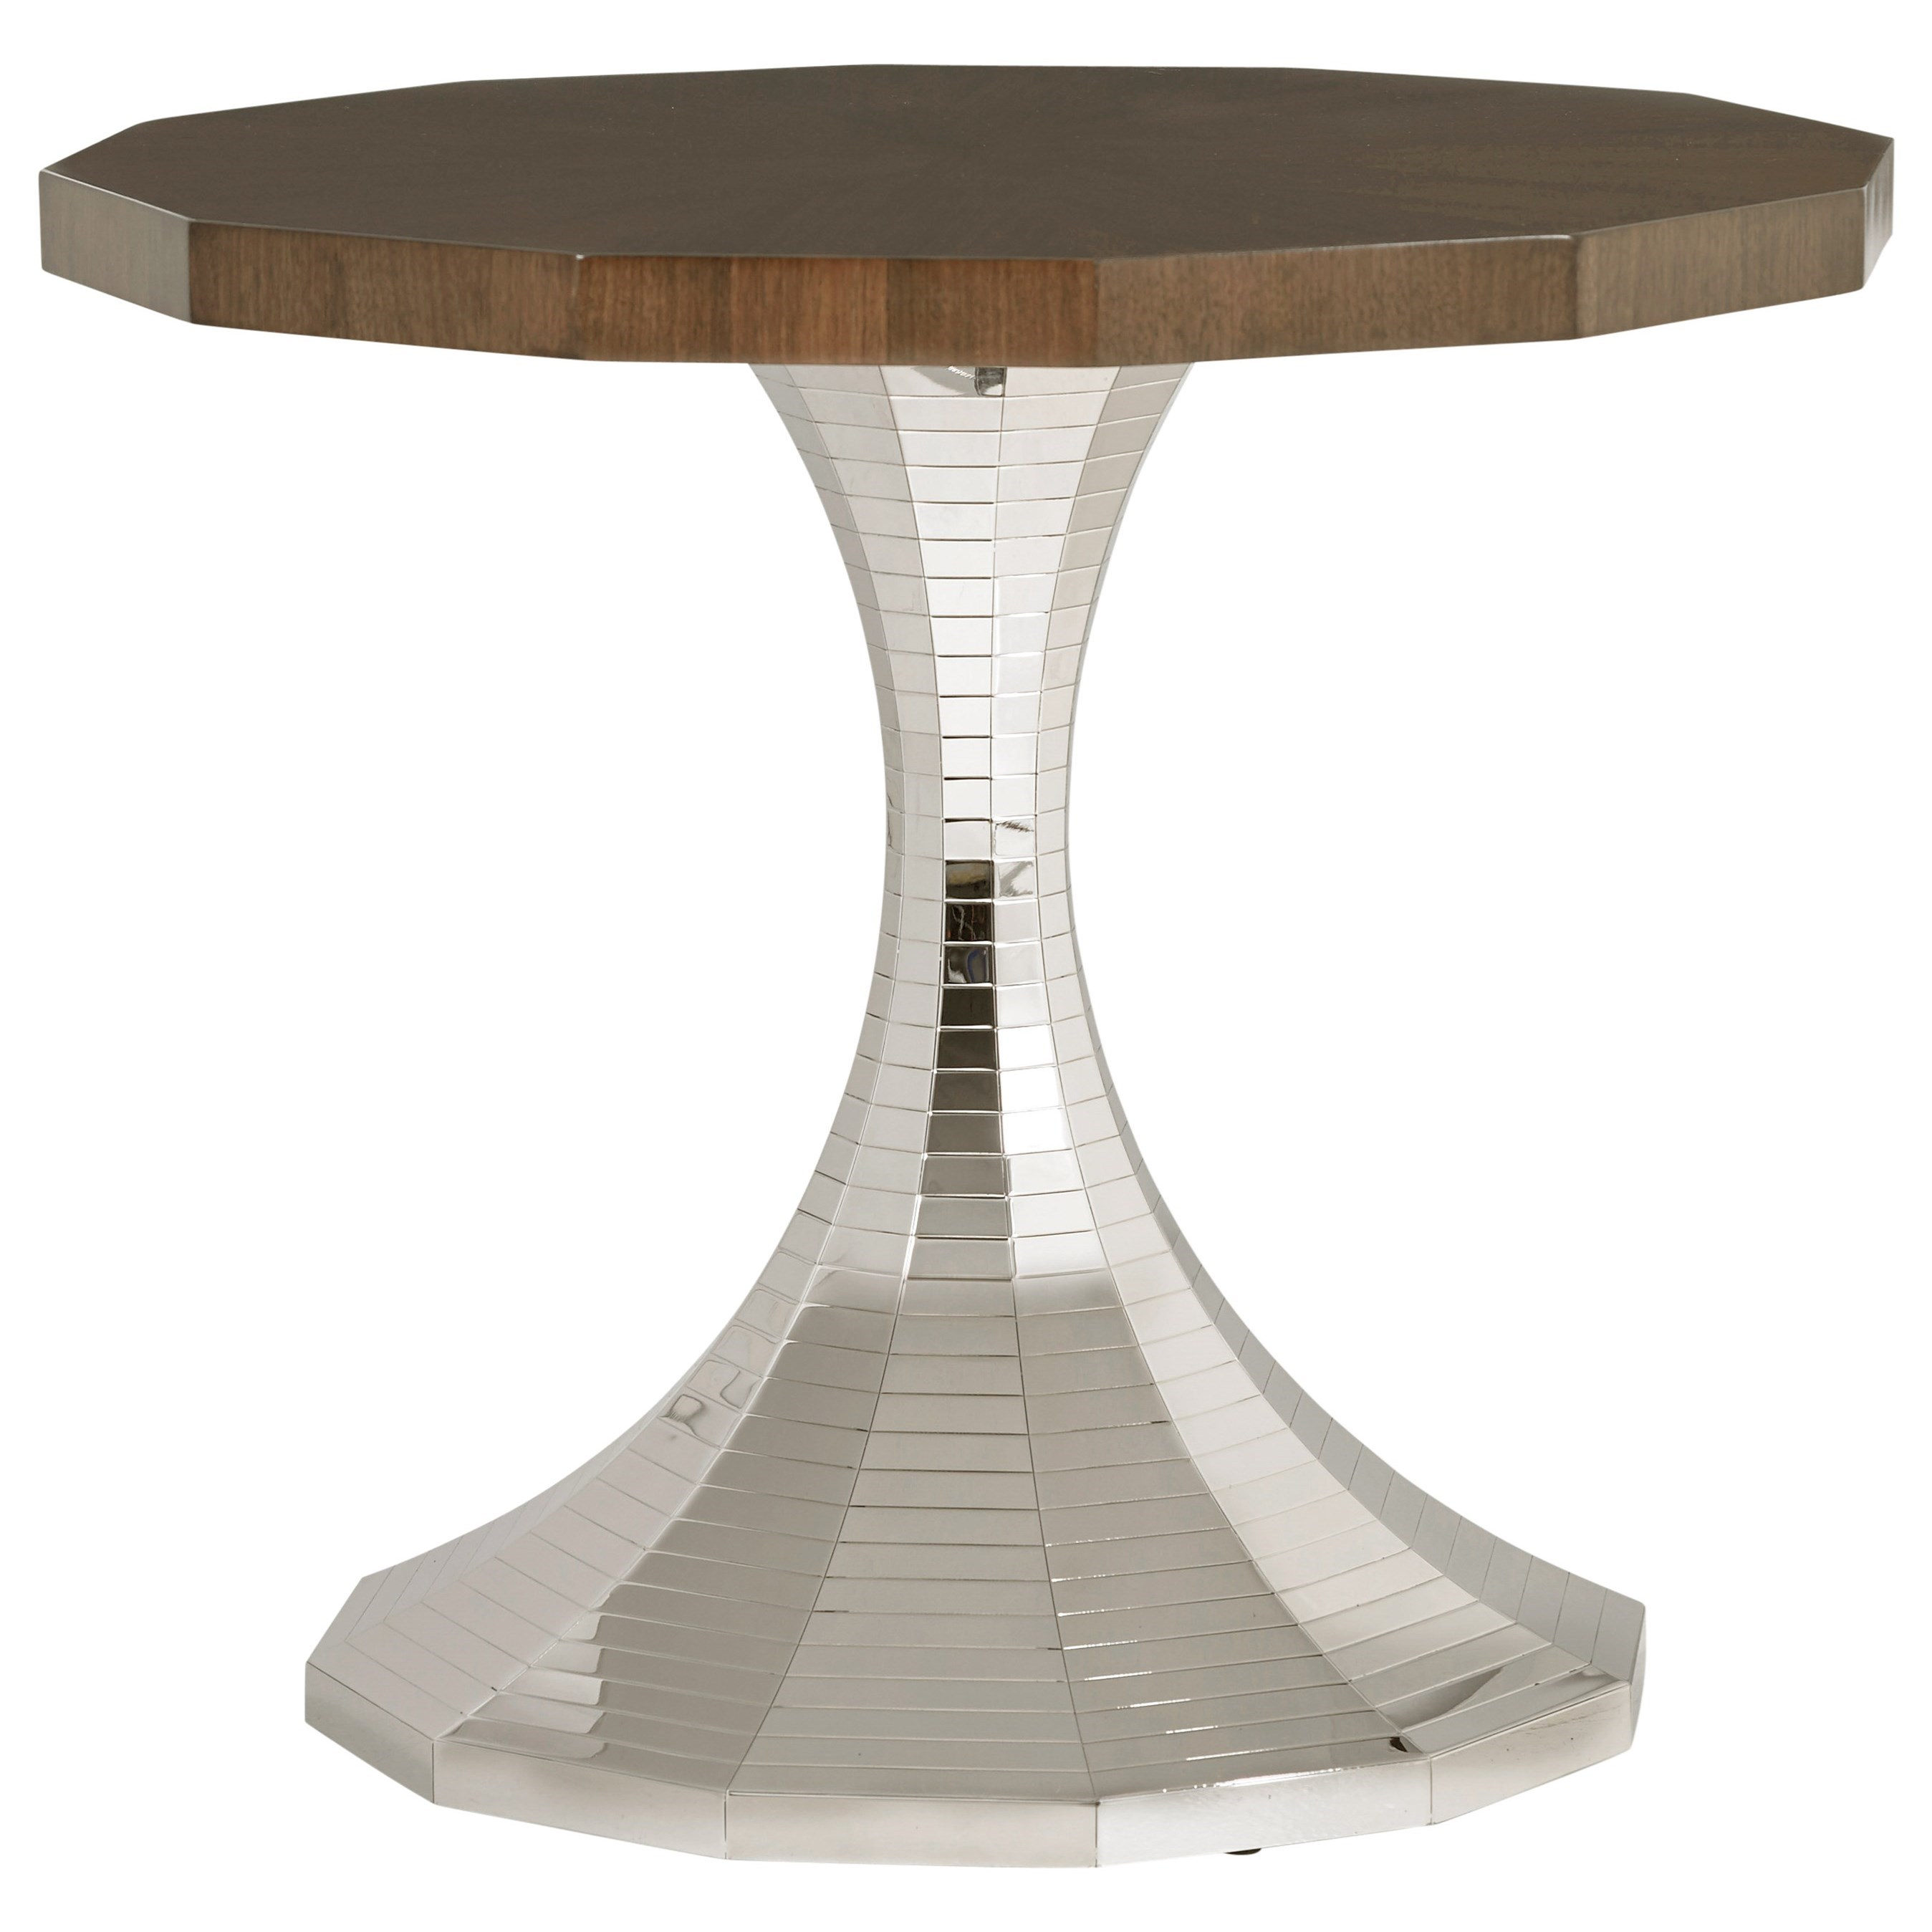 MacArthur Park Hermosa Center Table by Lexington at Johnny Janosik